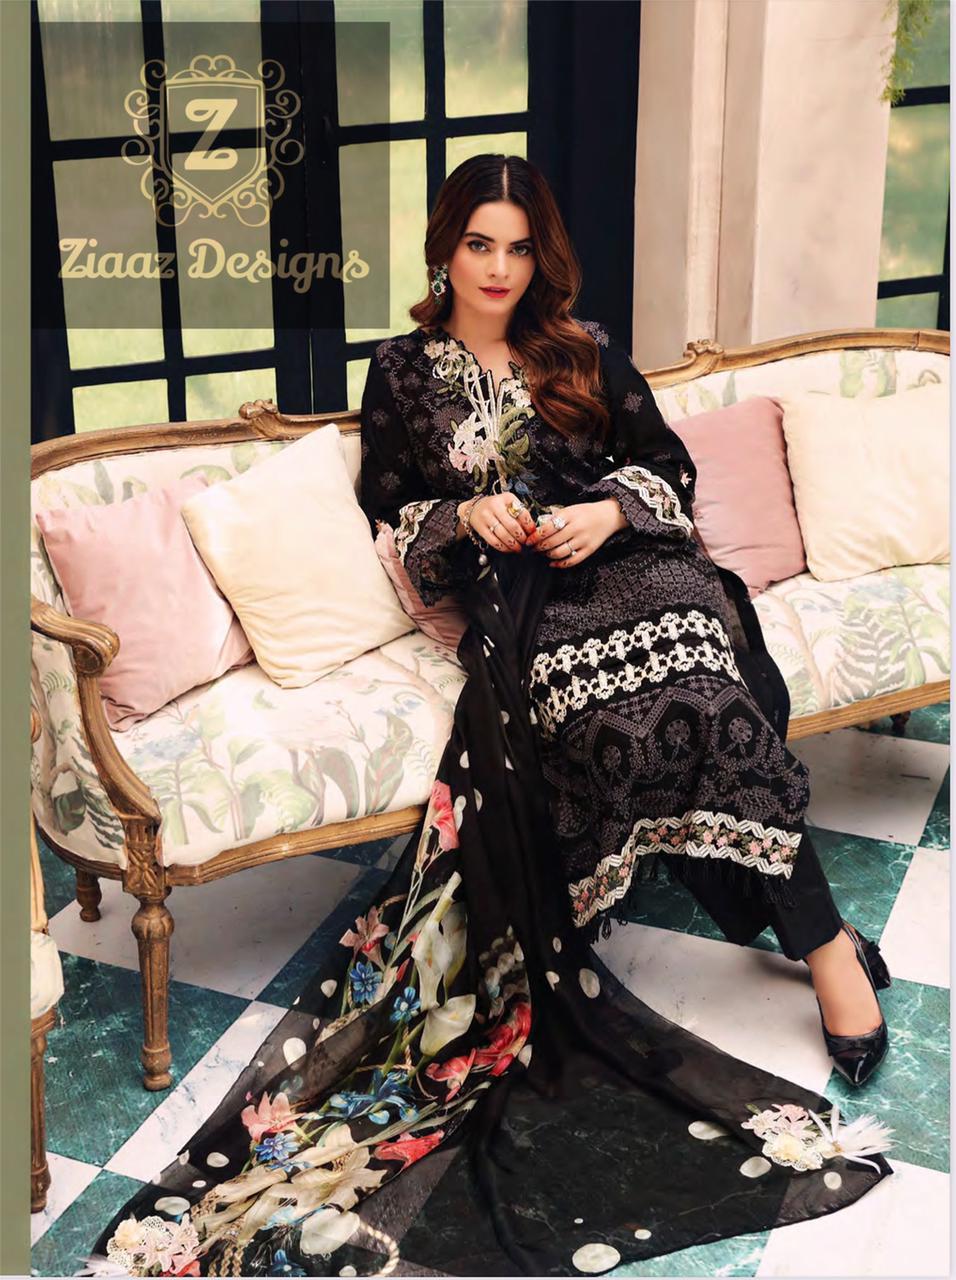 ZIAAZ DESIGNS  BLACK BEAUTY PAKISTANI DESSIGNER DRESS